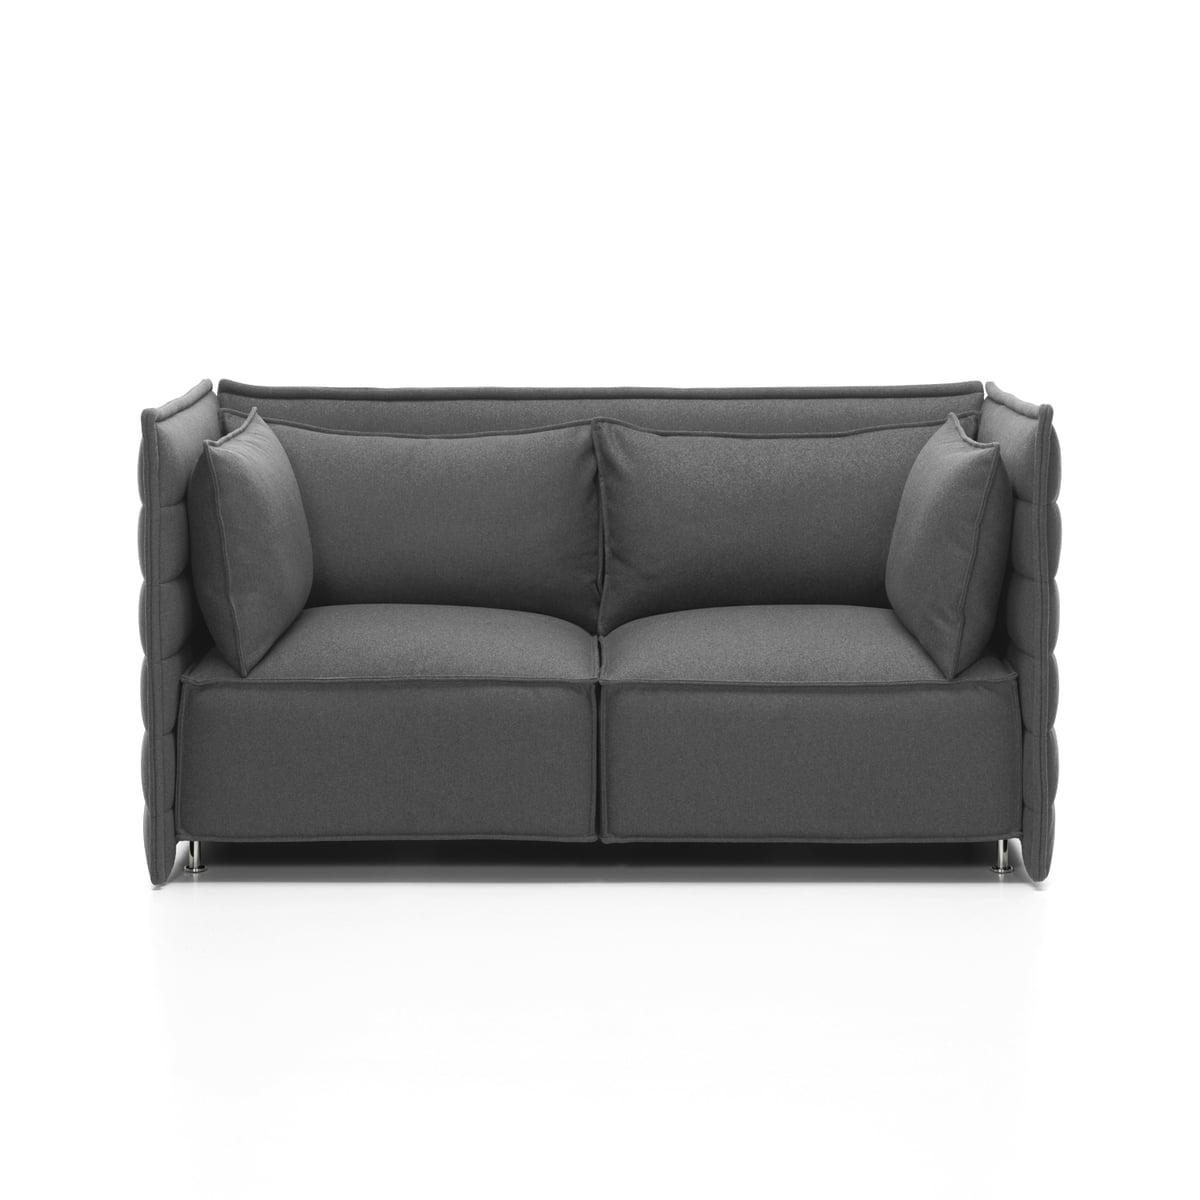 vitra sofa alcove highback gebraucht refil sofa. Black Bedroom Furniture Sets. Home Design Ideas